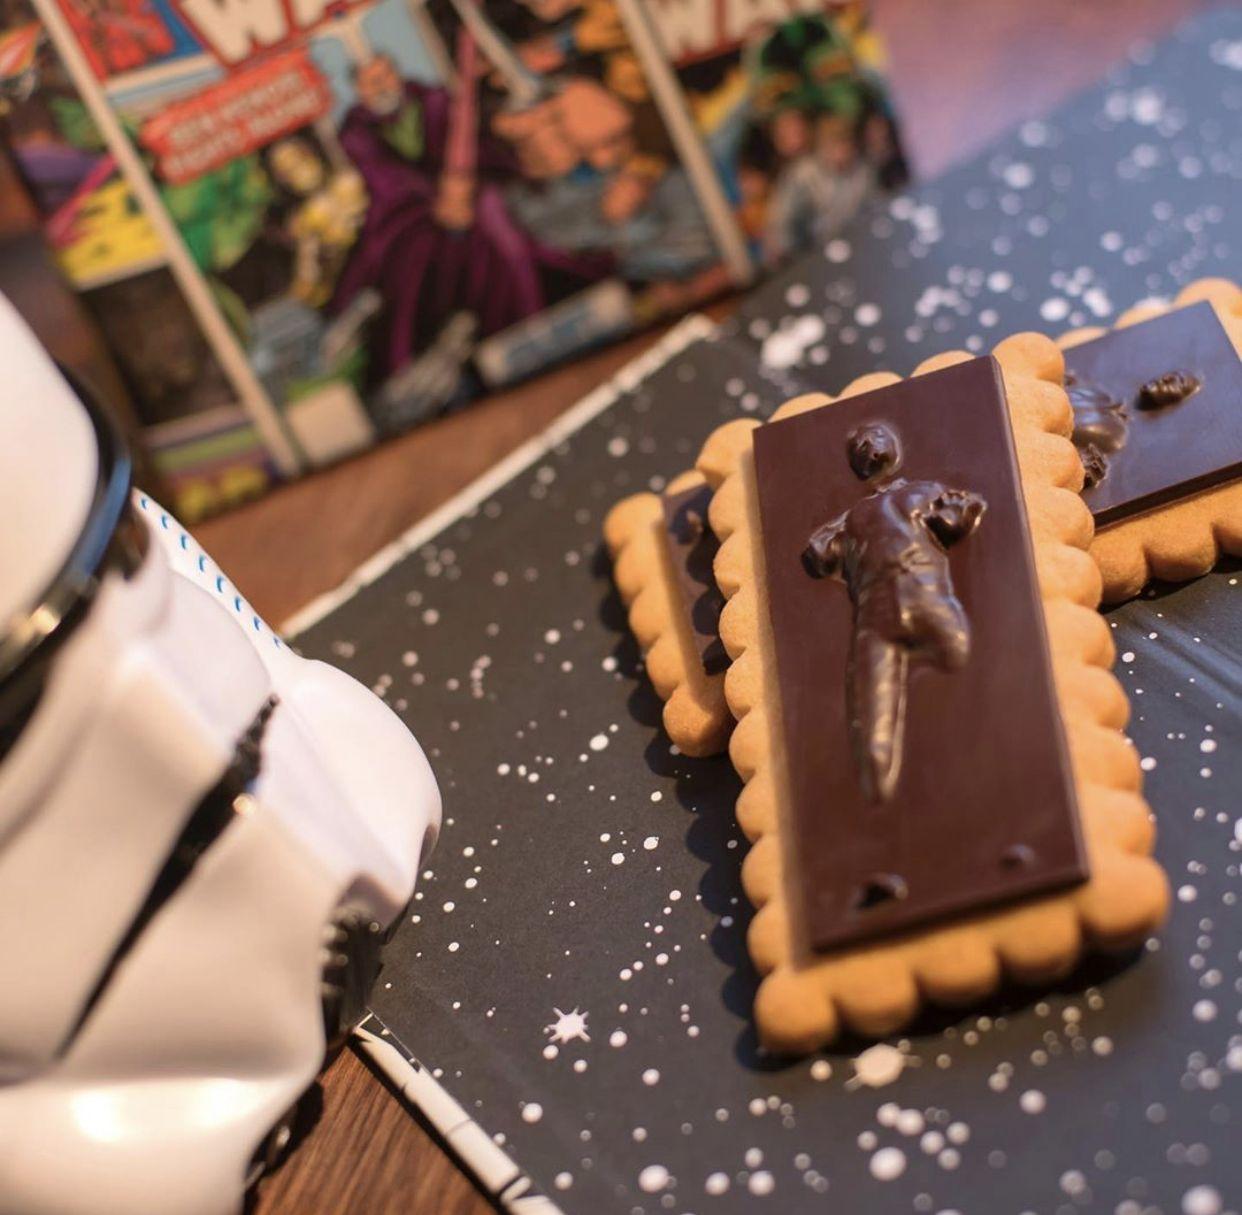 Disneyland Paris is Celebrating 'Star Wars' With a